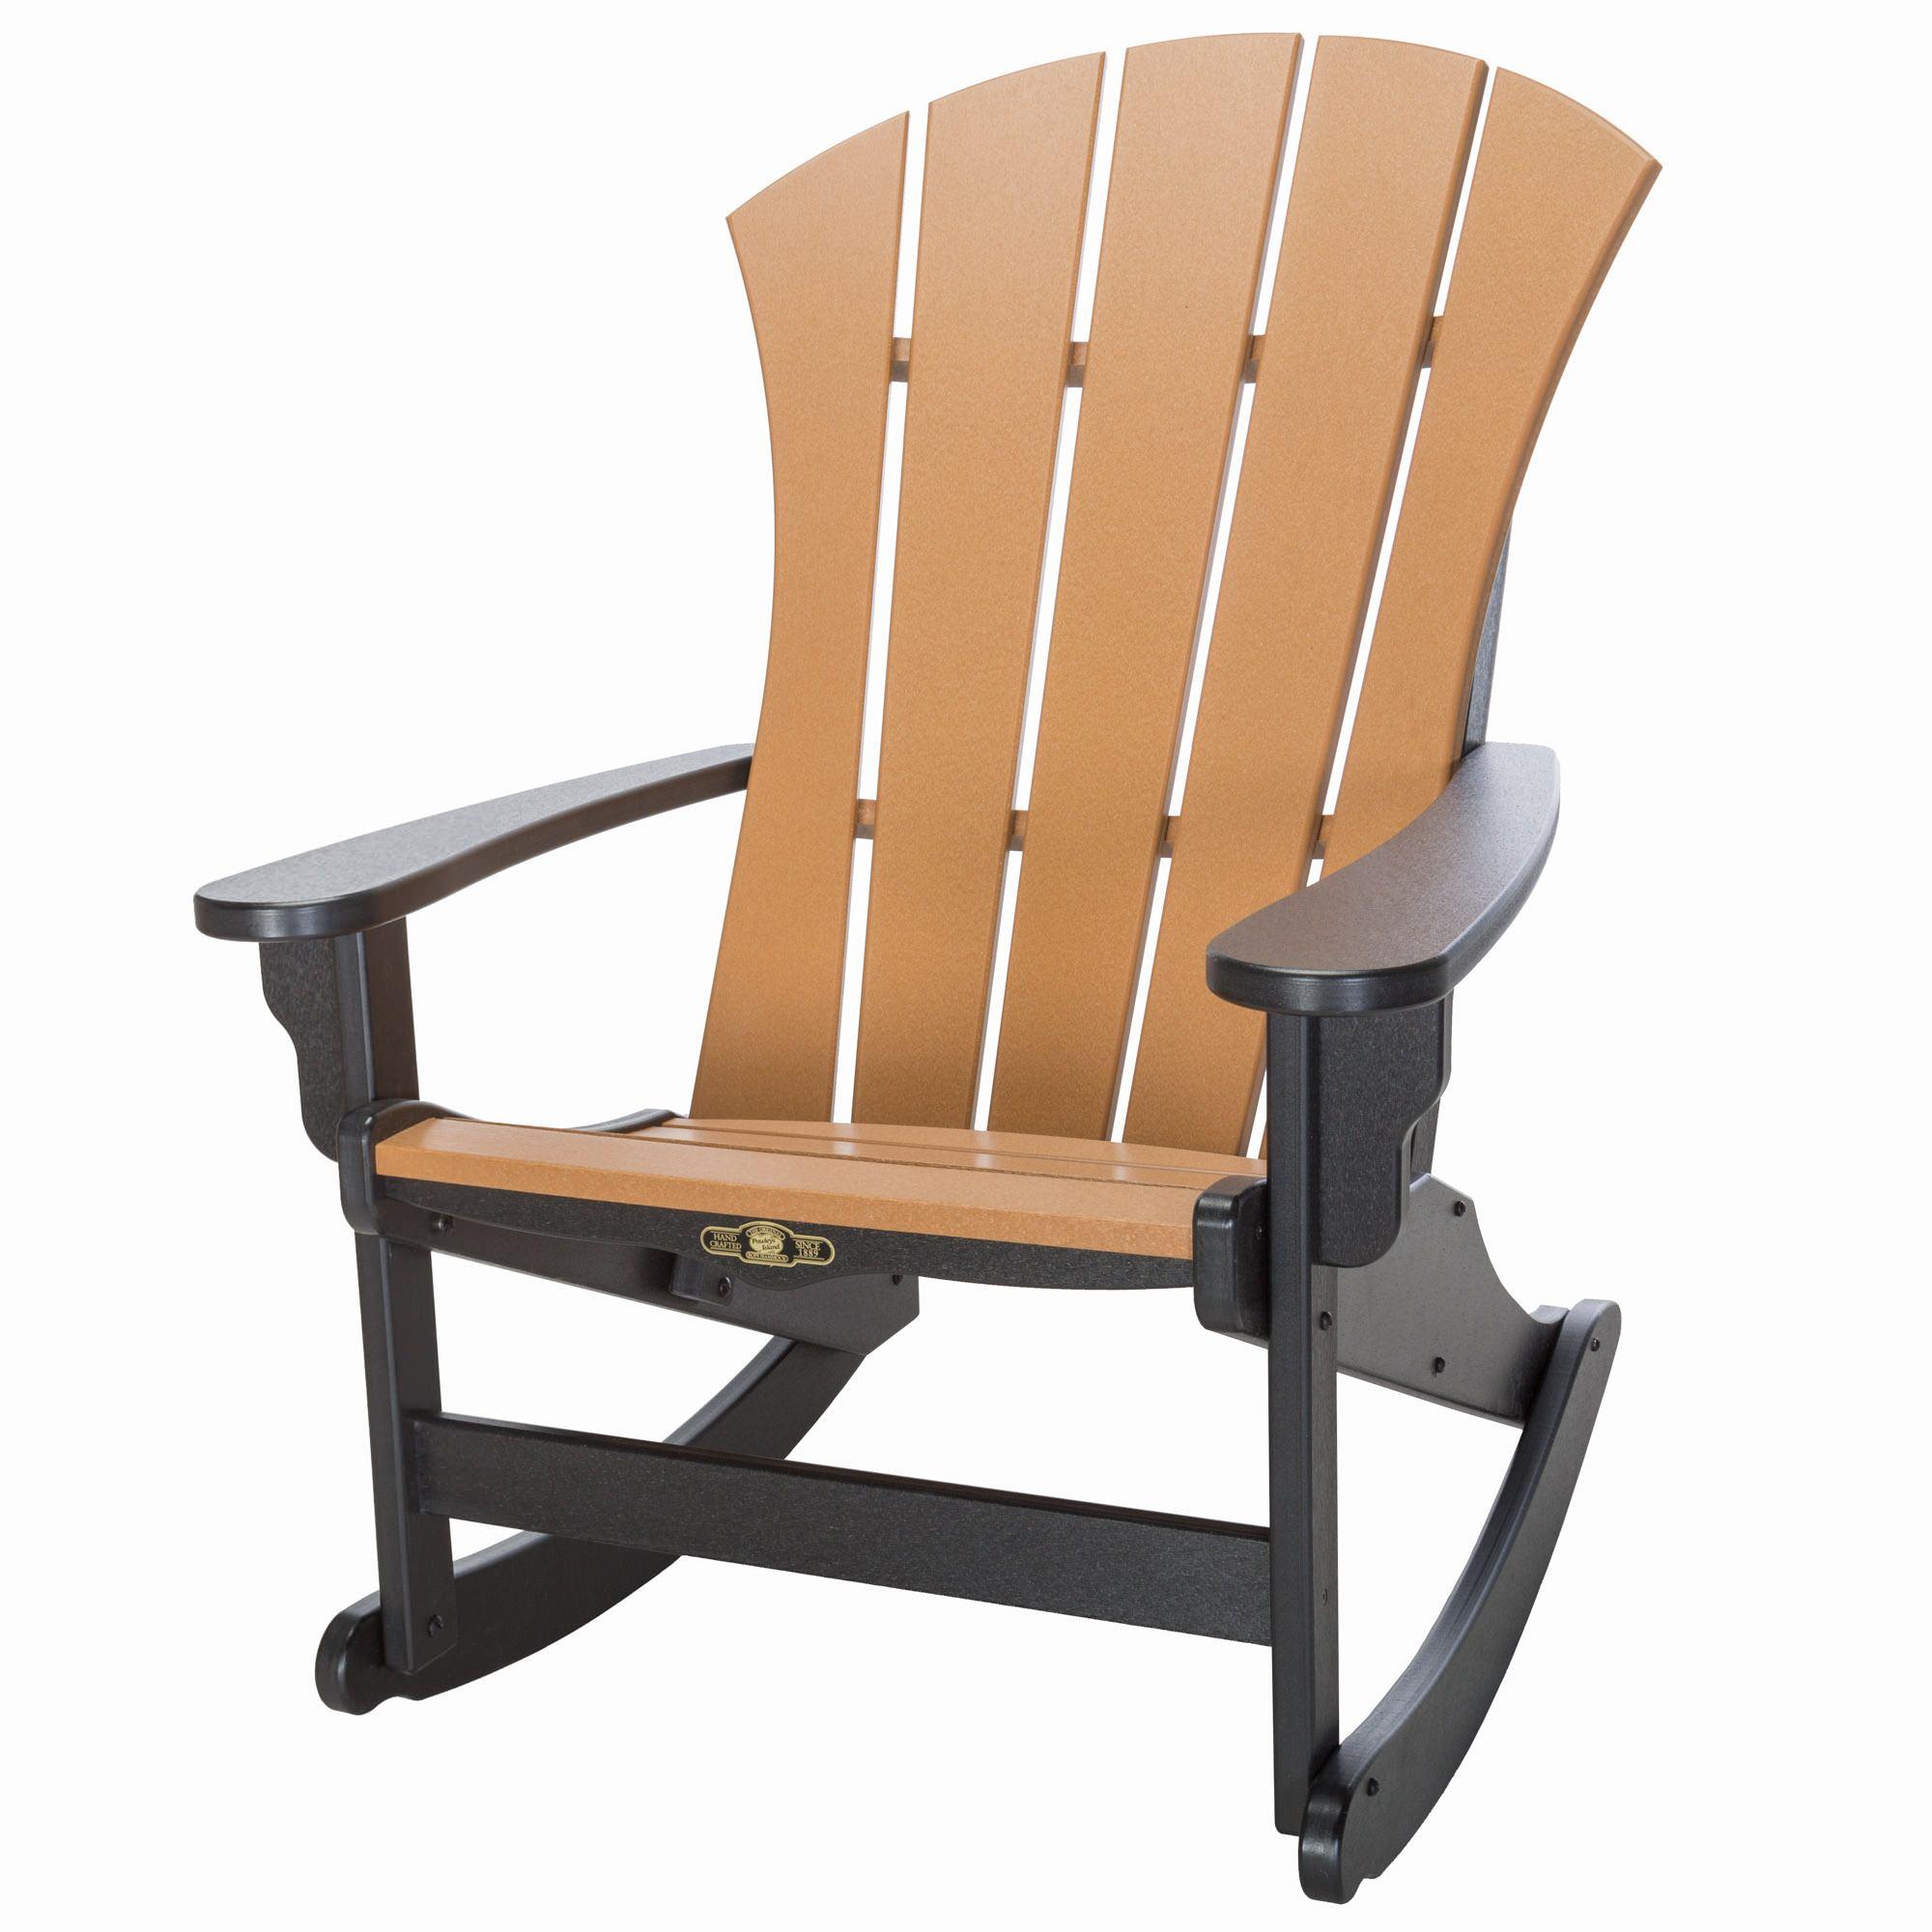 trex adirondack rocking chairs kijaro sling chair shop durawood sunrise rockers on sale